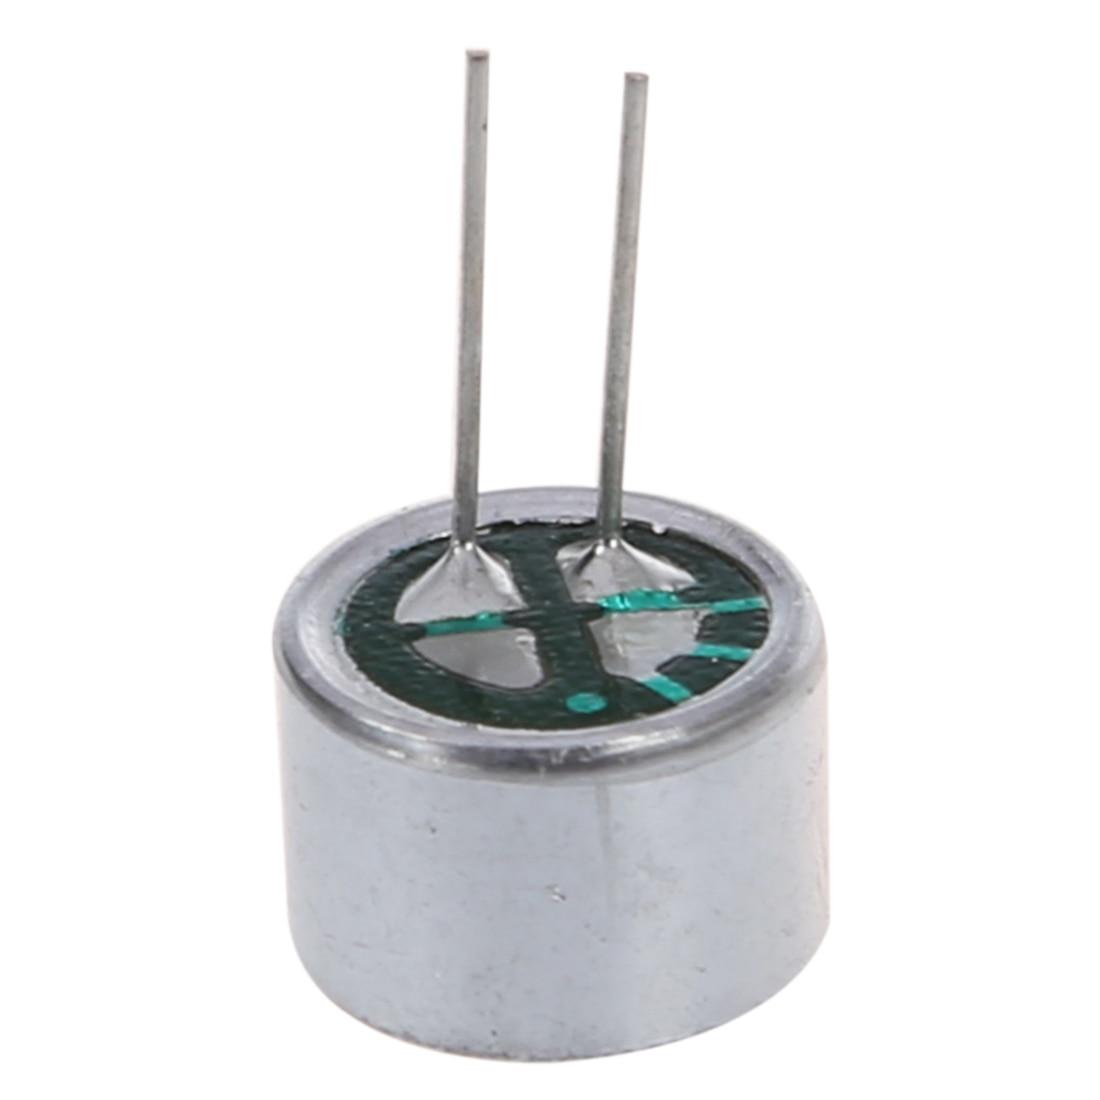 10 PCS 9.7mm X 7mm 2 Pin MIC Capsule Electret Condenser Miniphone